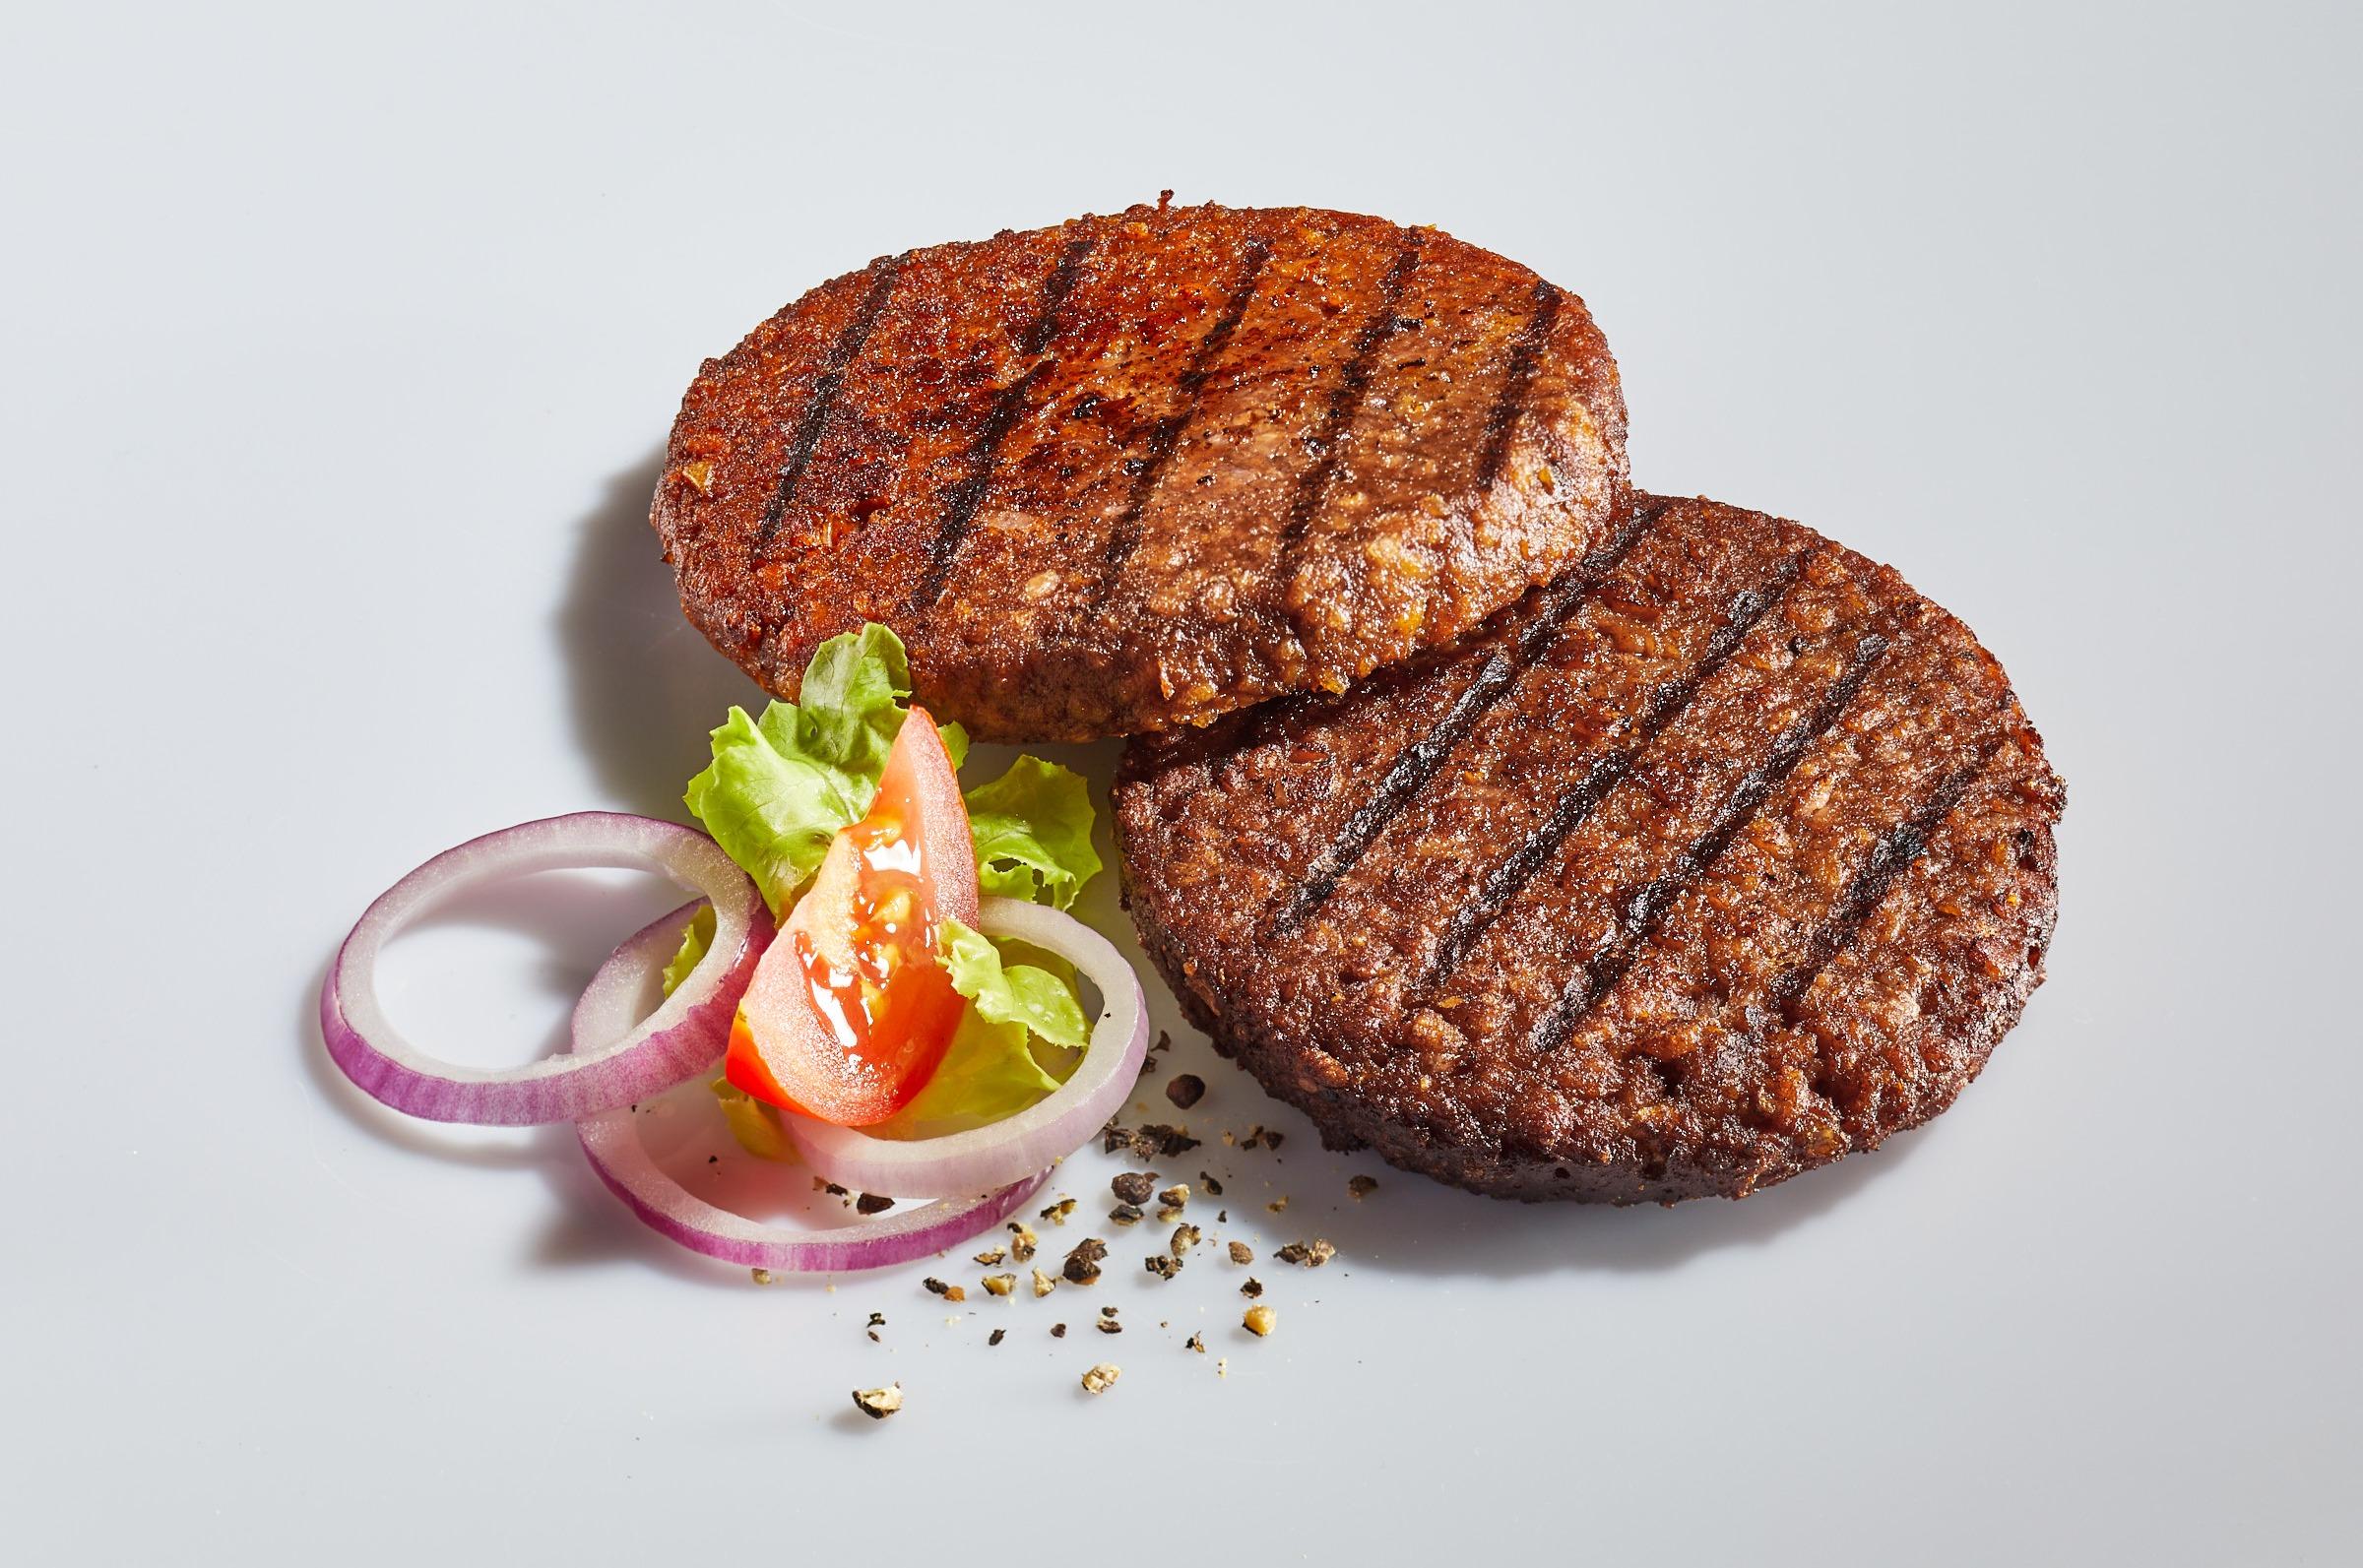 Beefless smoky Burger - 5 kilo - VeggieMeat